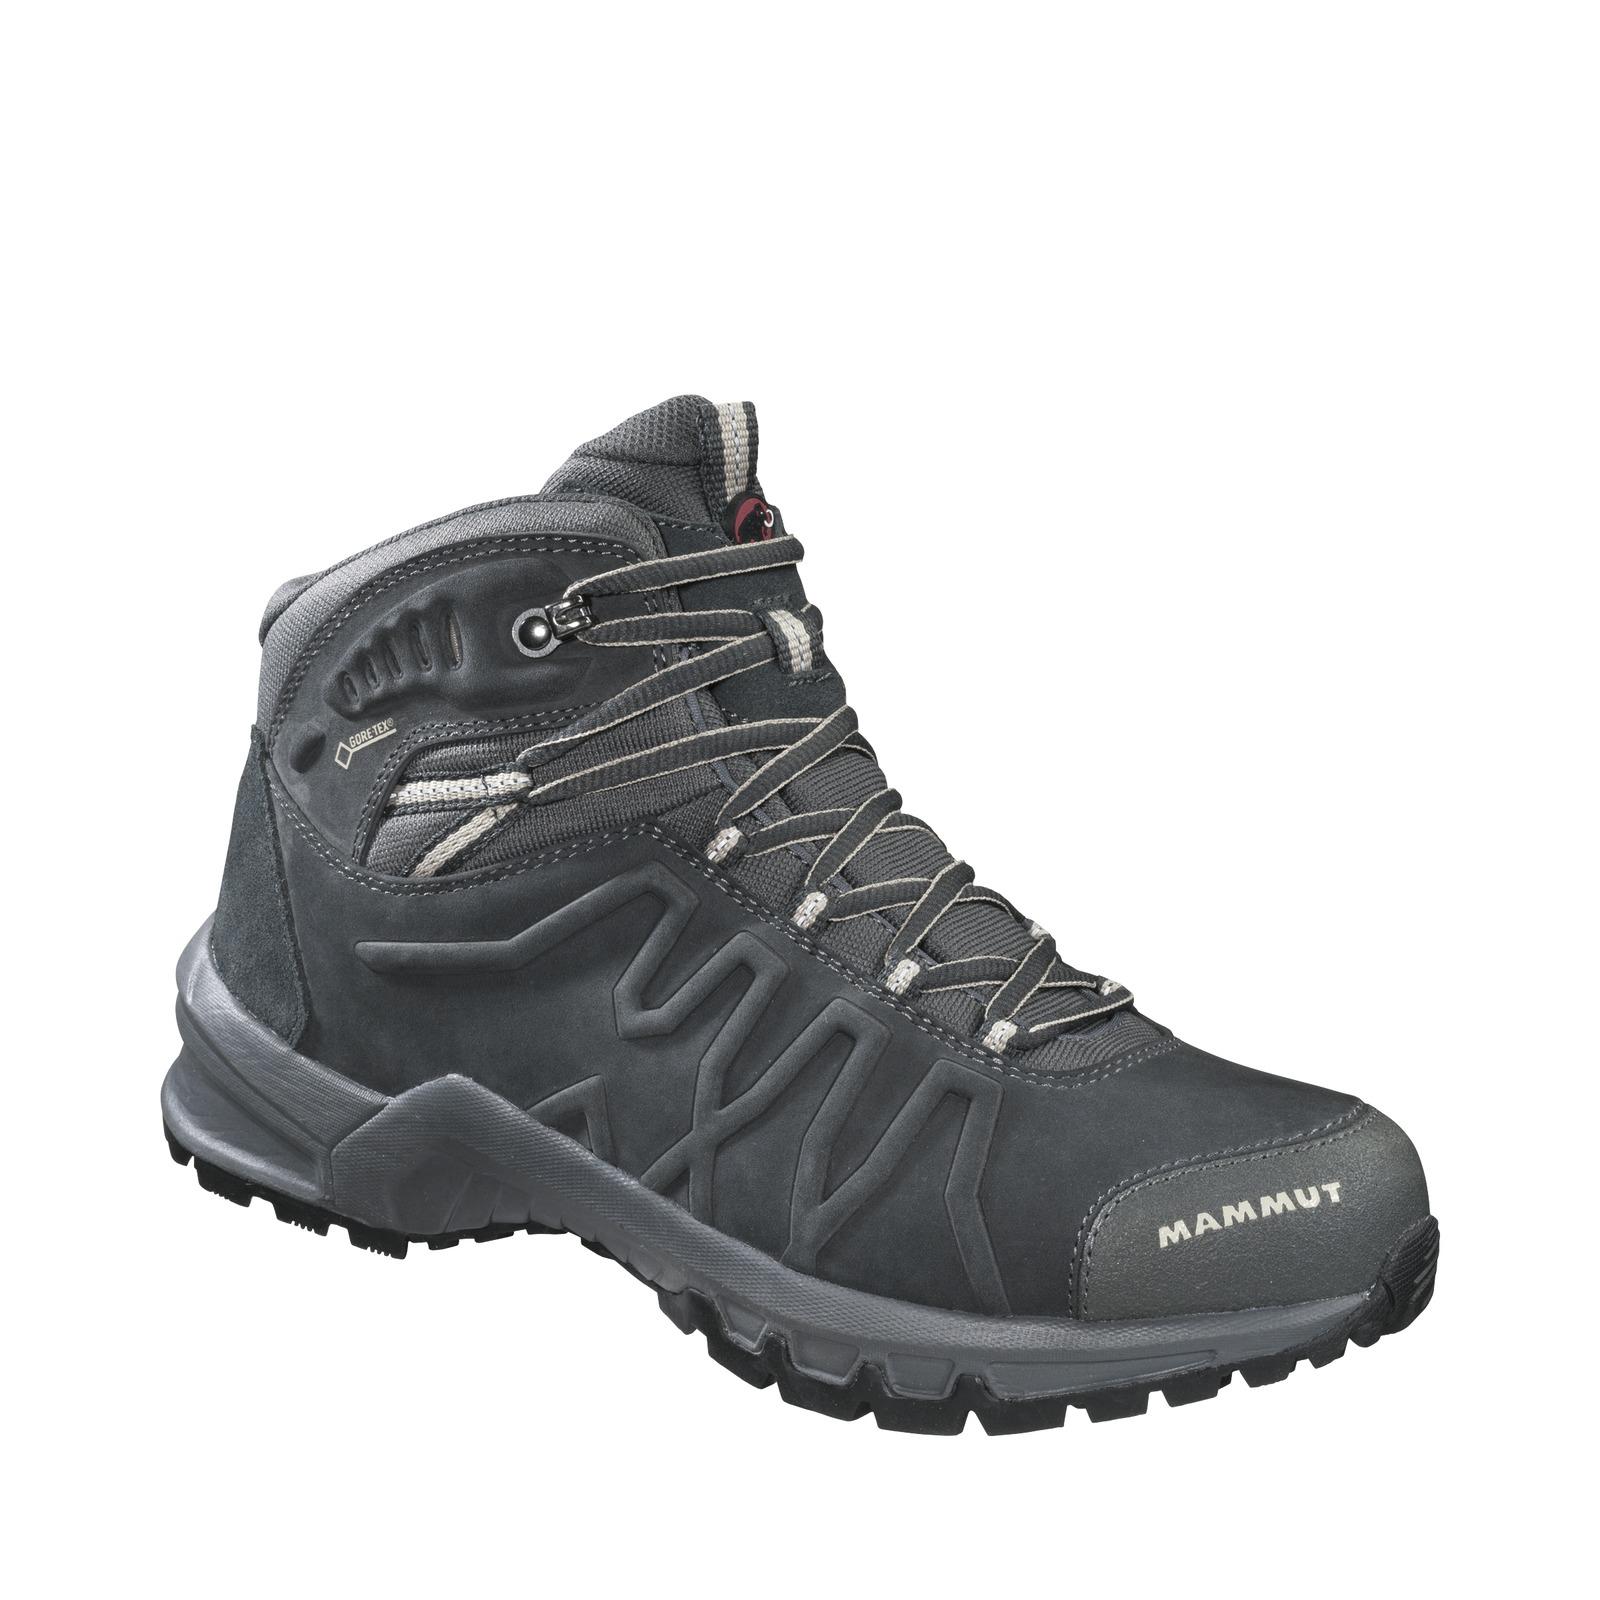 Herren Schuhe Mercury Mid II GTX, graphite-taupe, 8